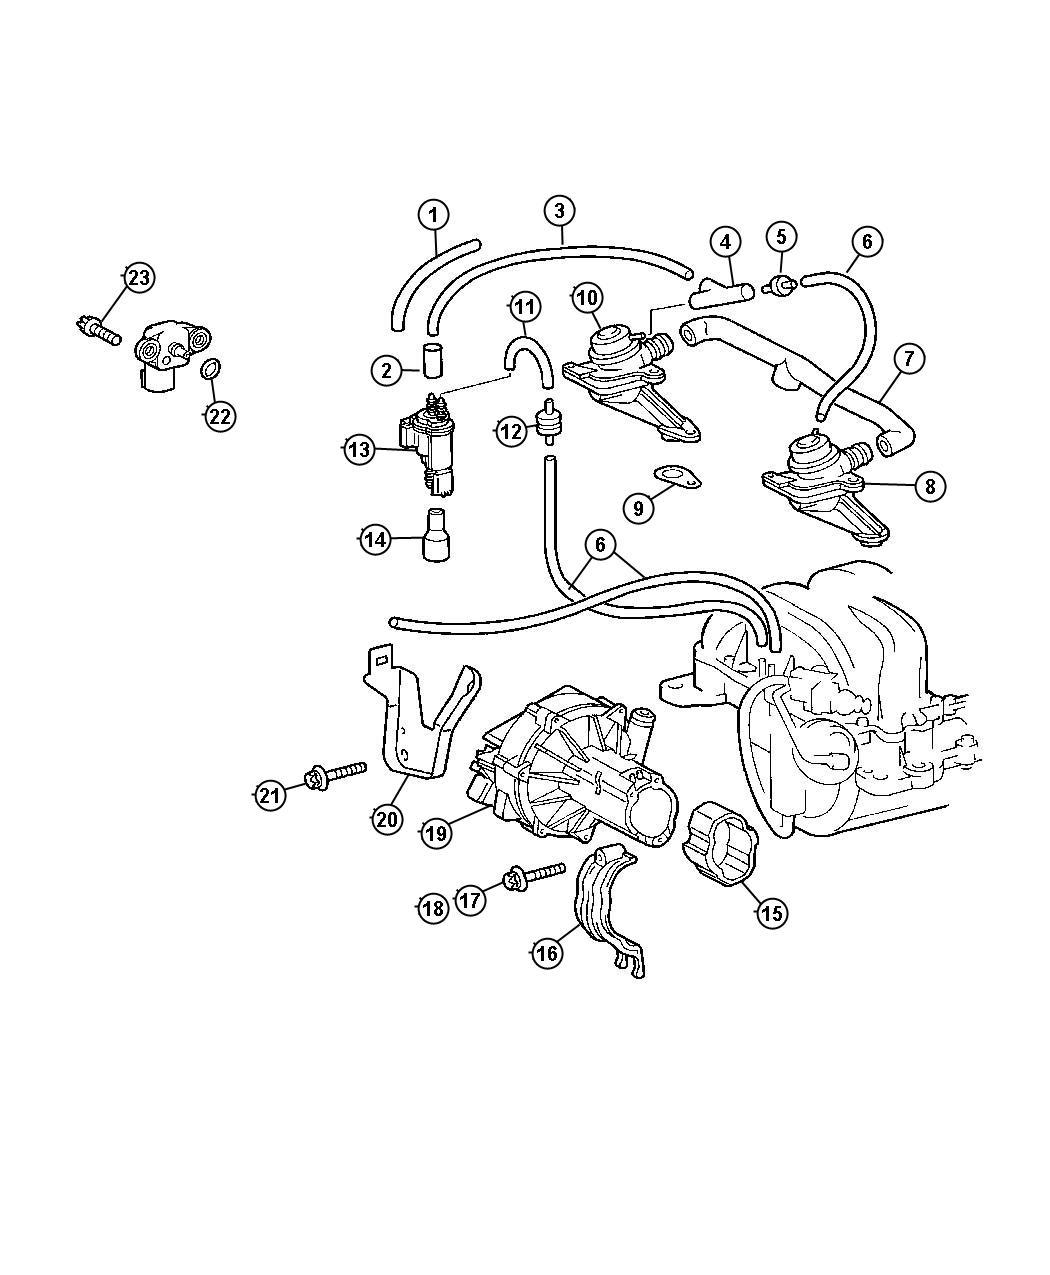 Chrysler Crossfire Pump Air Shutoff